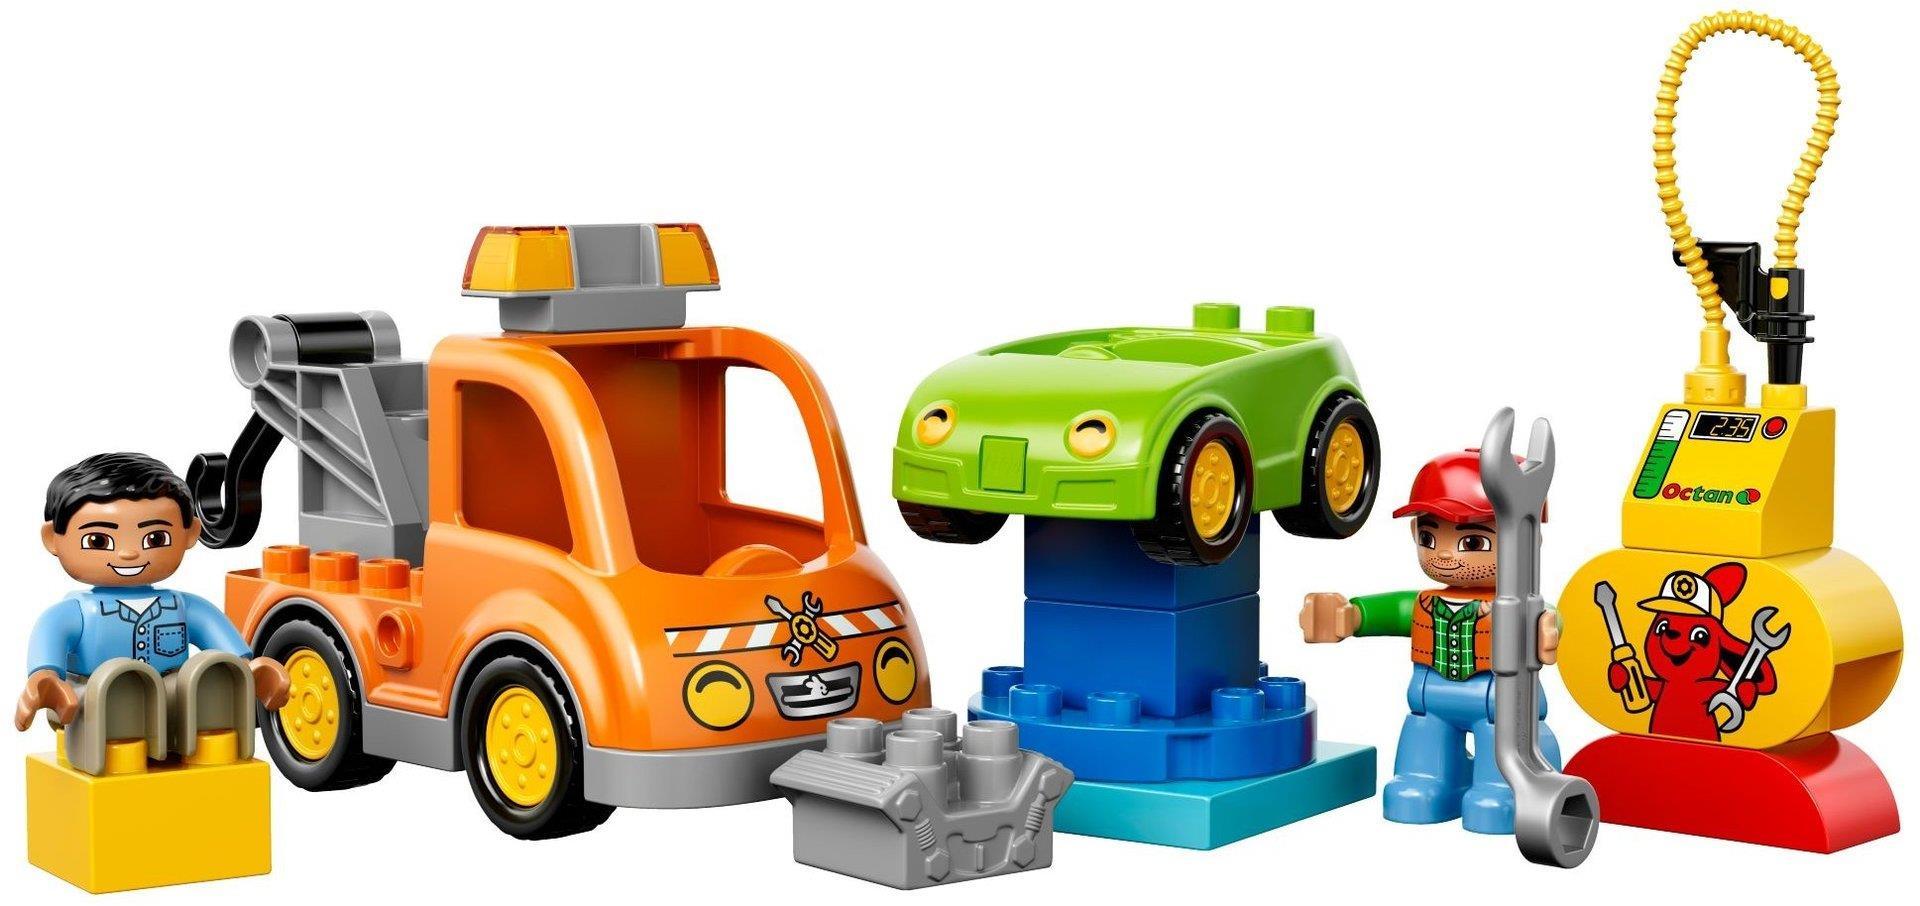 LEGO DUPLO - Tow Truck (10814)